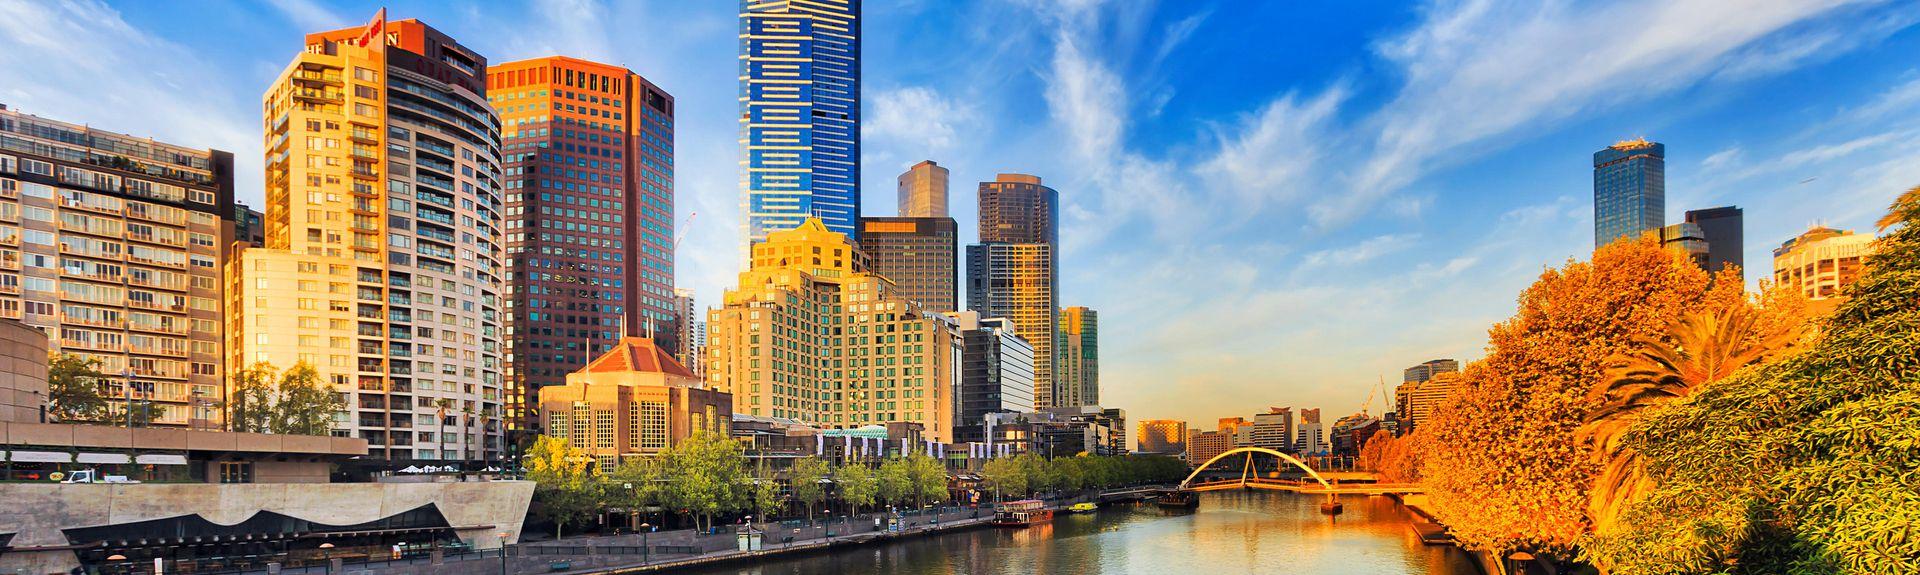 South Yarra, Melbourne, Victoria, Australia